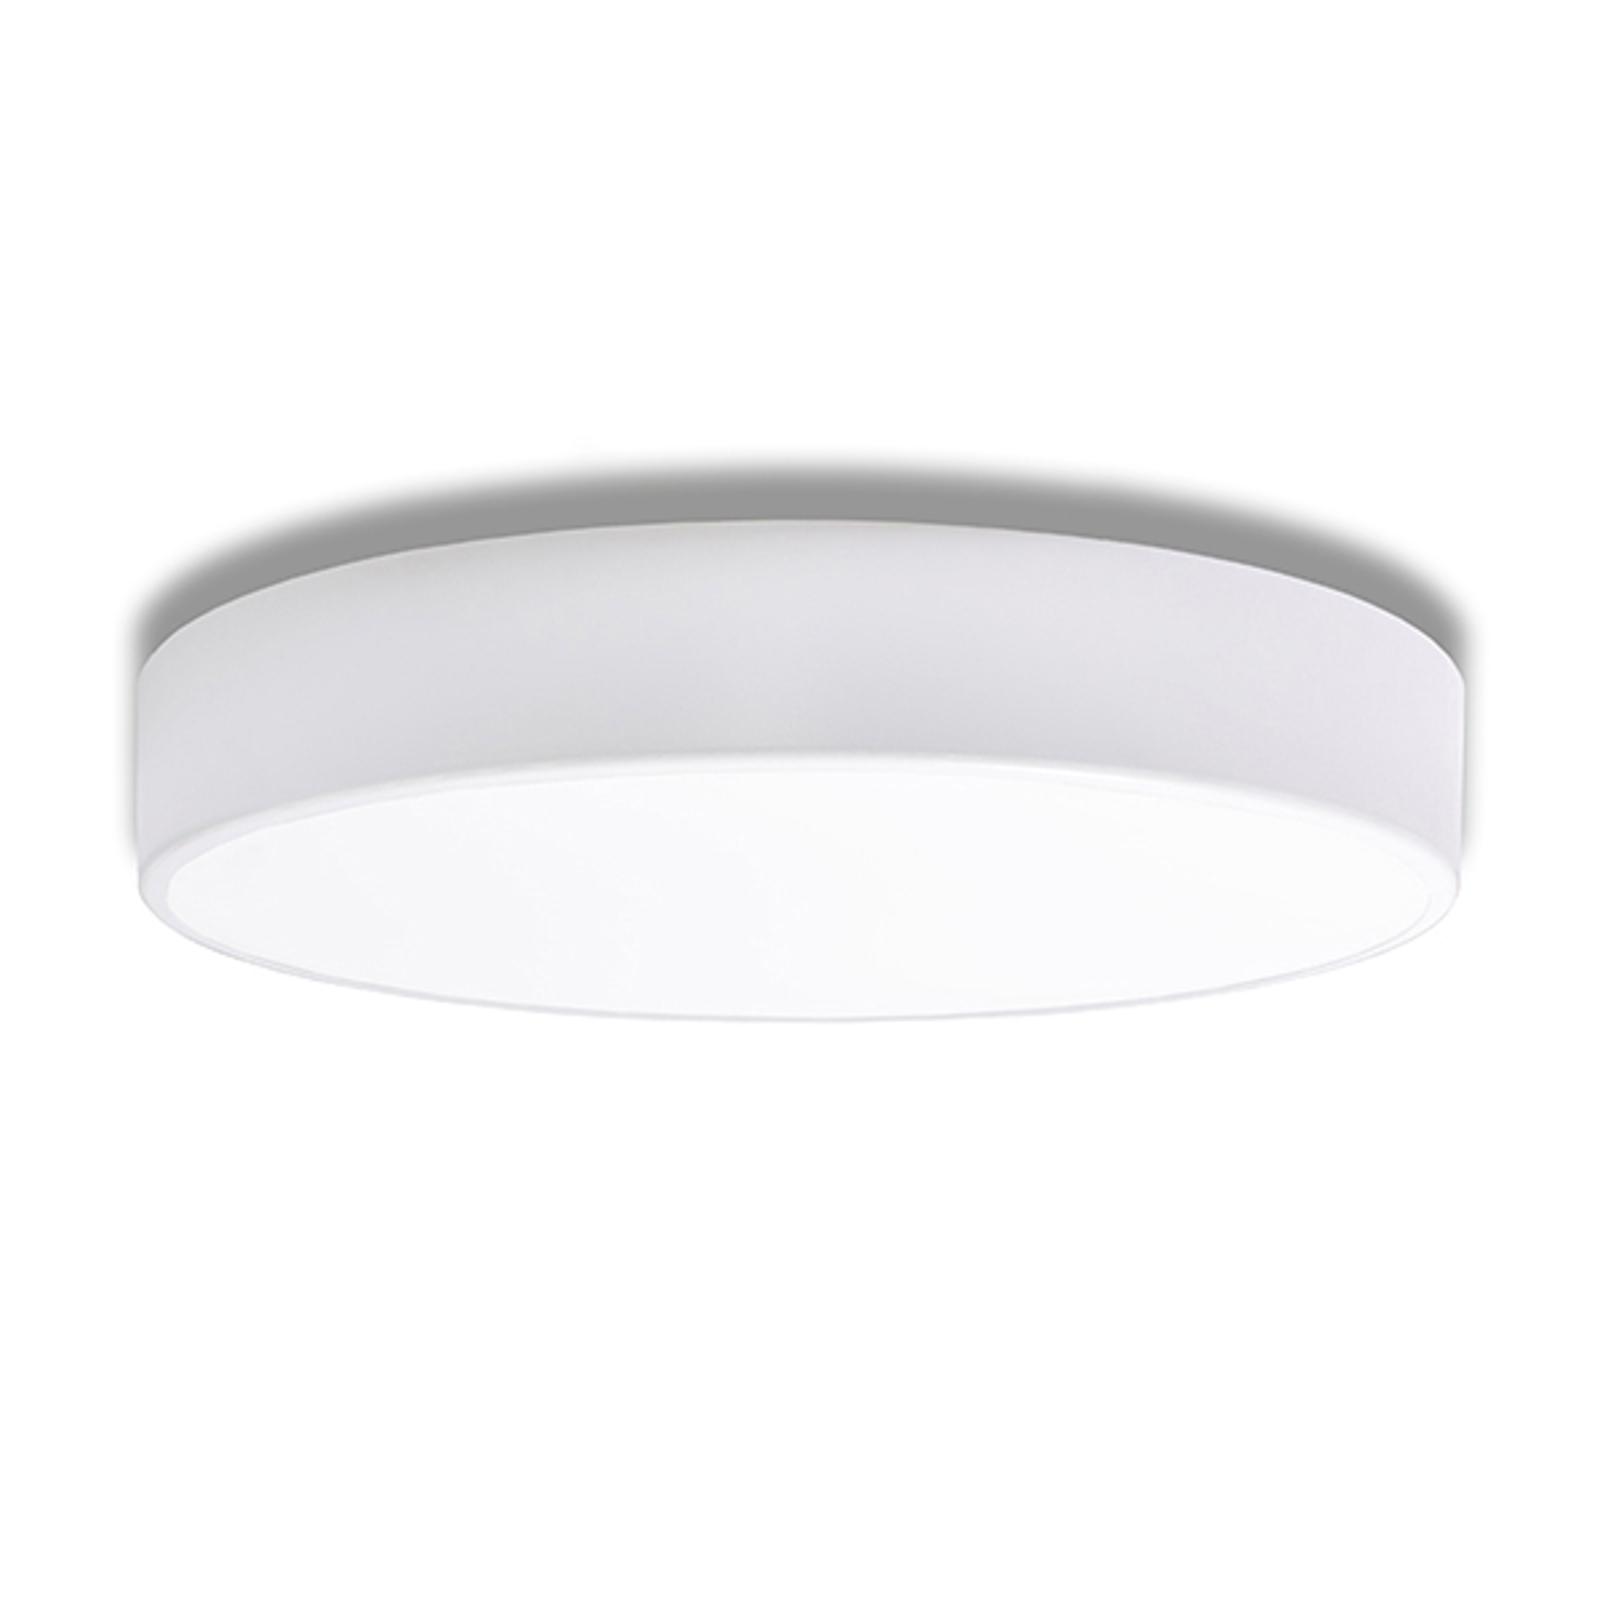 Taklampe Cleo, Ø 50 cm, hvit